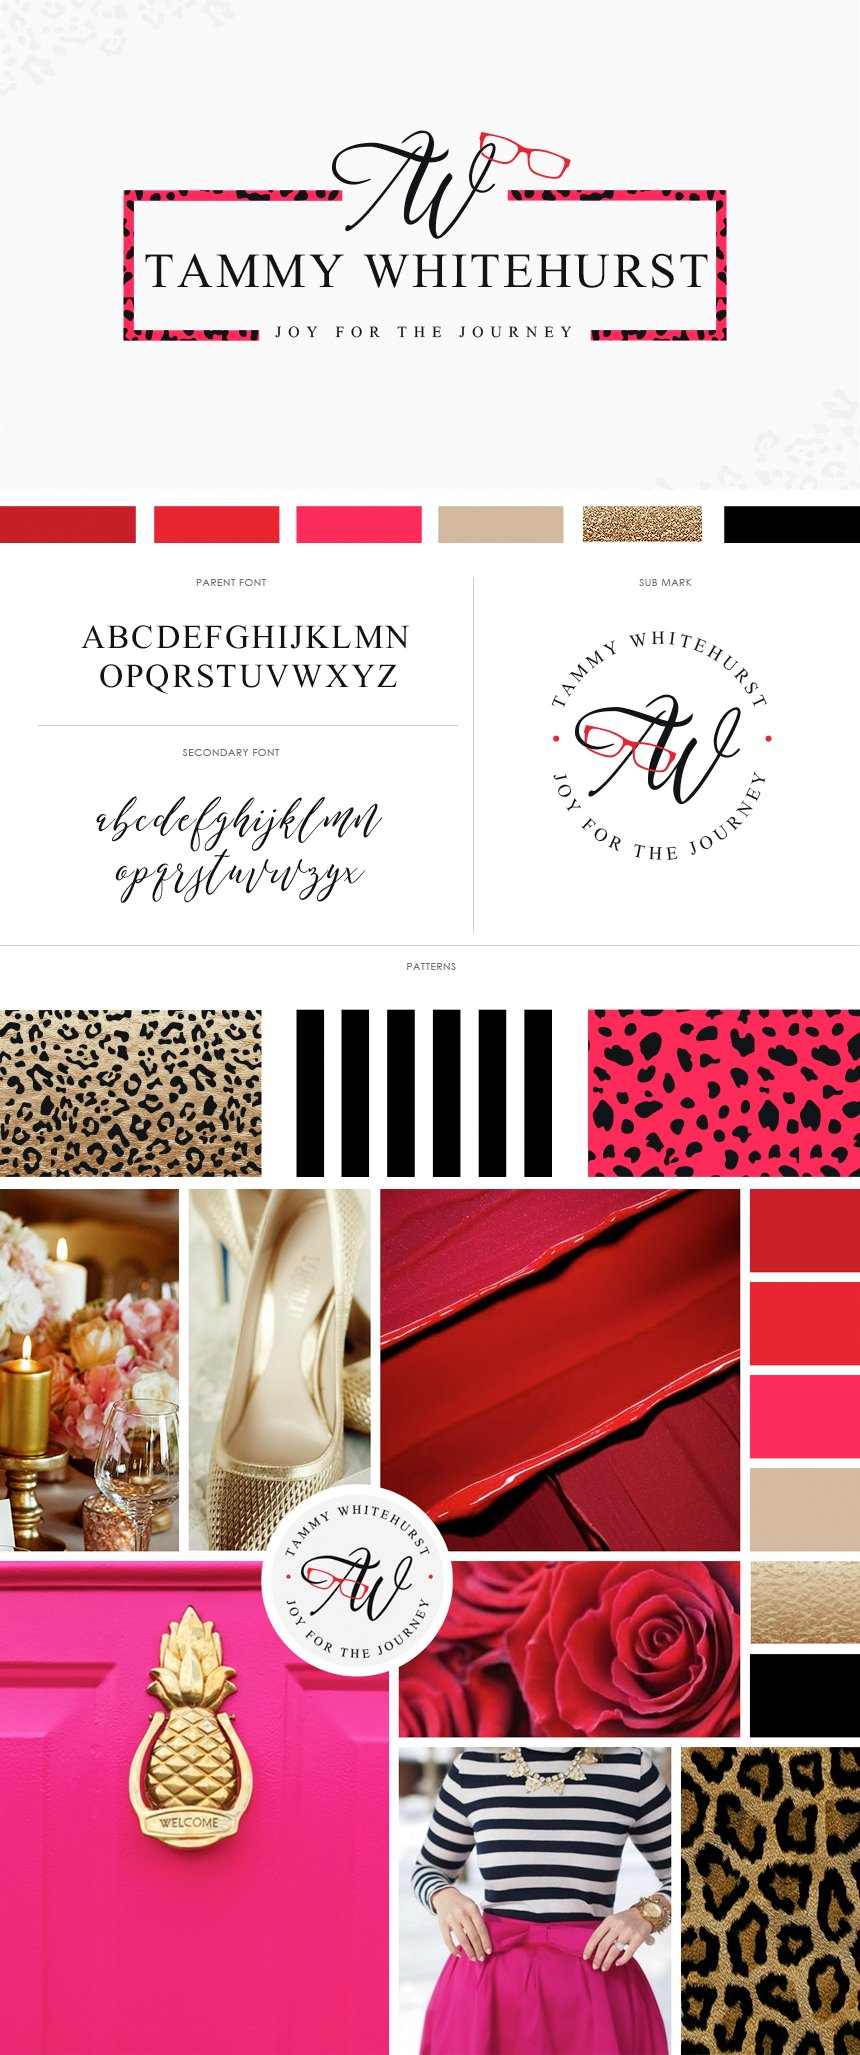 My-Random-Mind-Blog-Logo-Design-by-C-Monica-Design